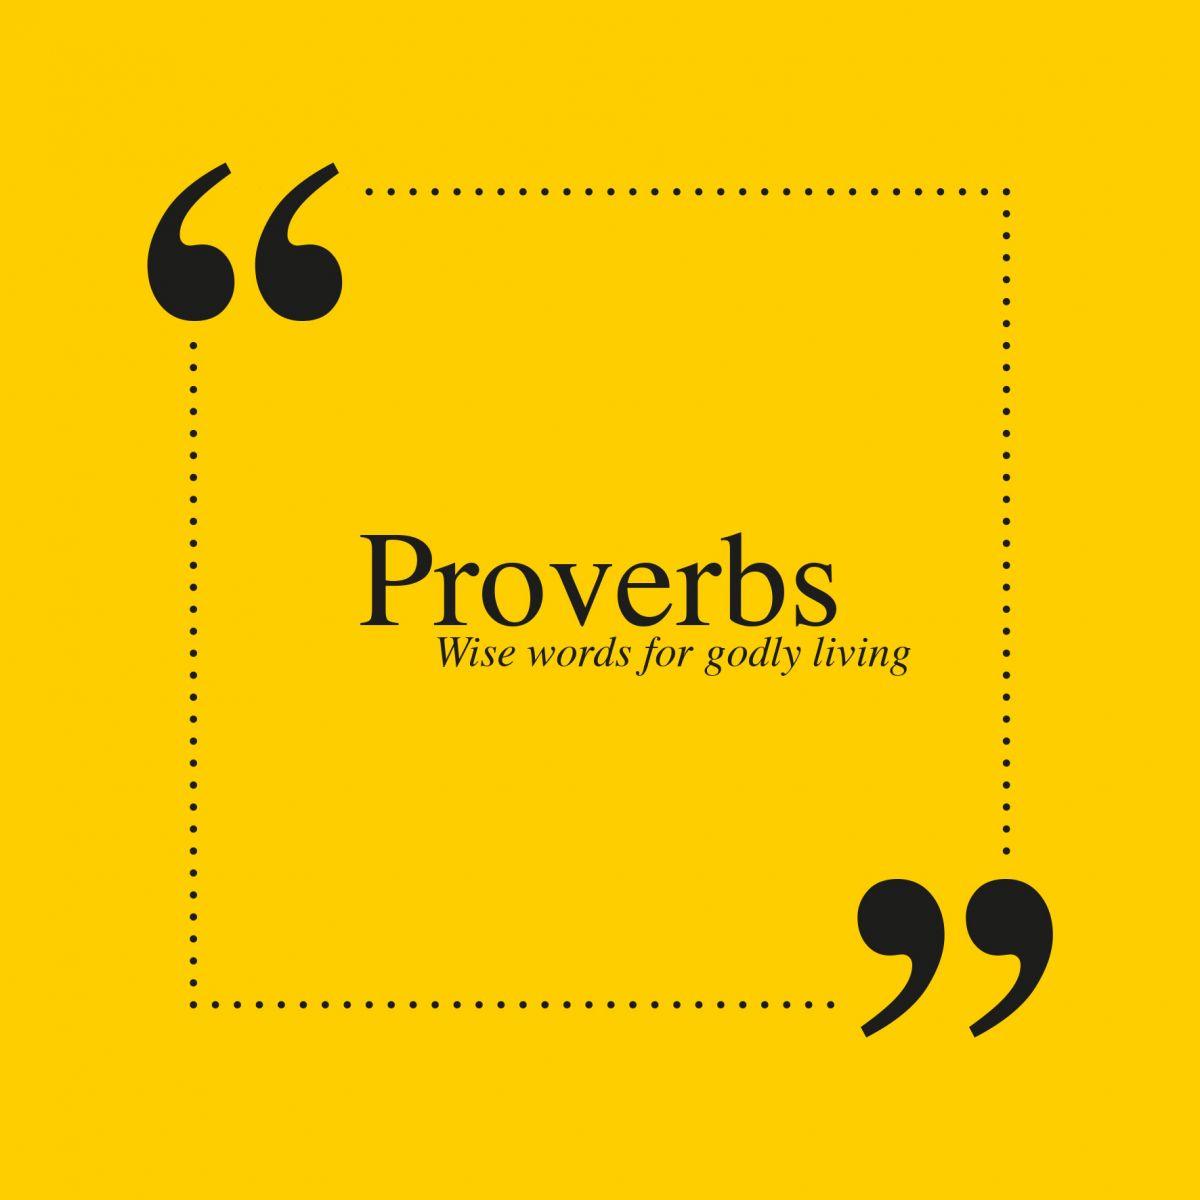 Proverbs Friendship Sermon : Peter lawther archives carrickfergus baptist church